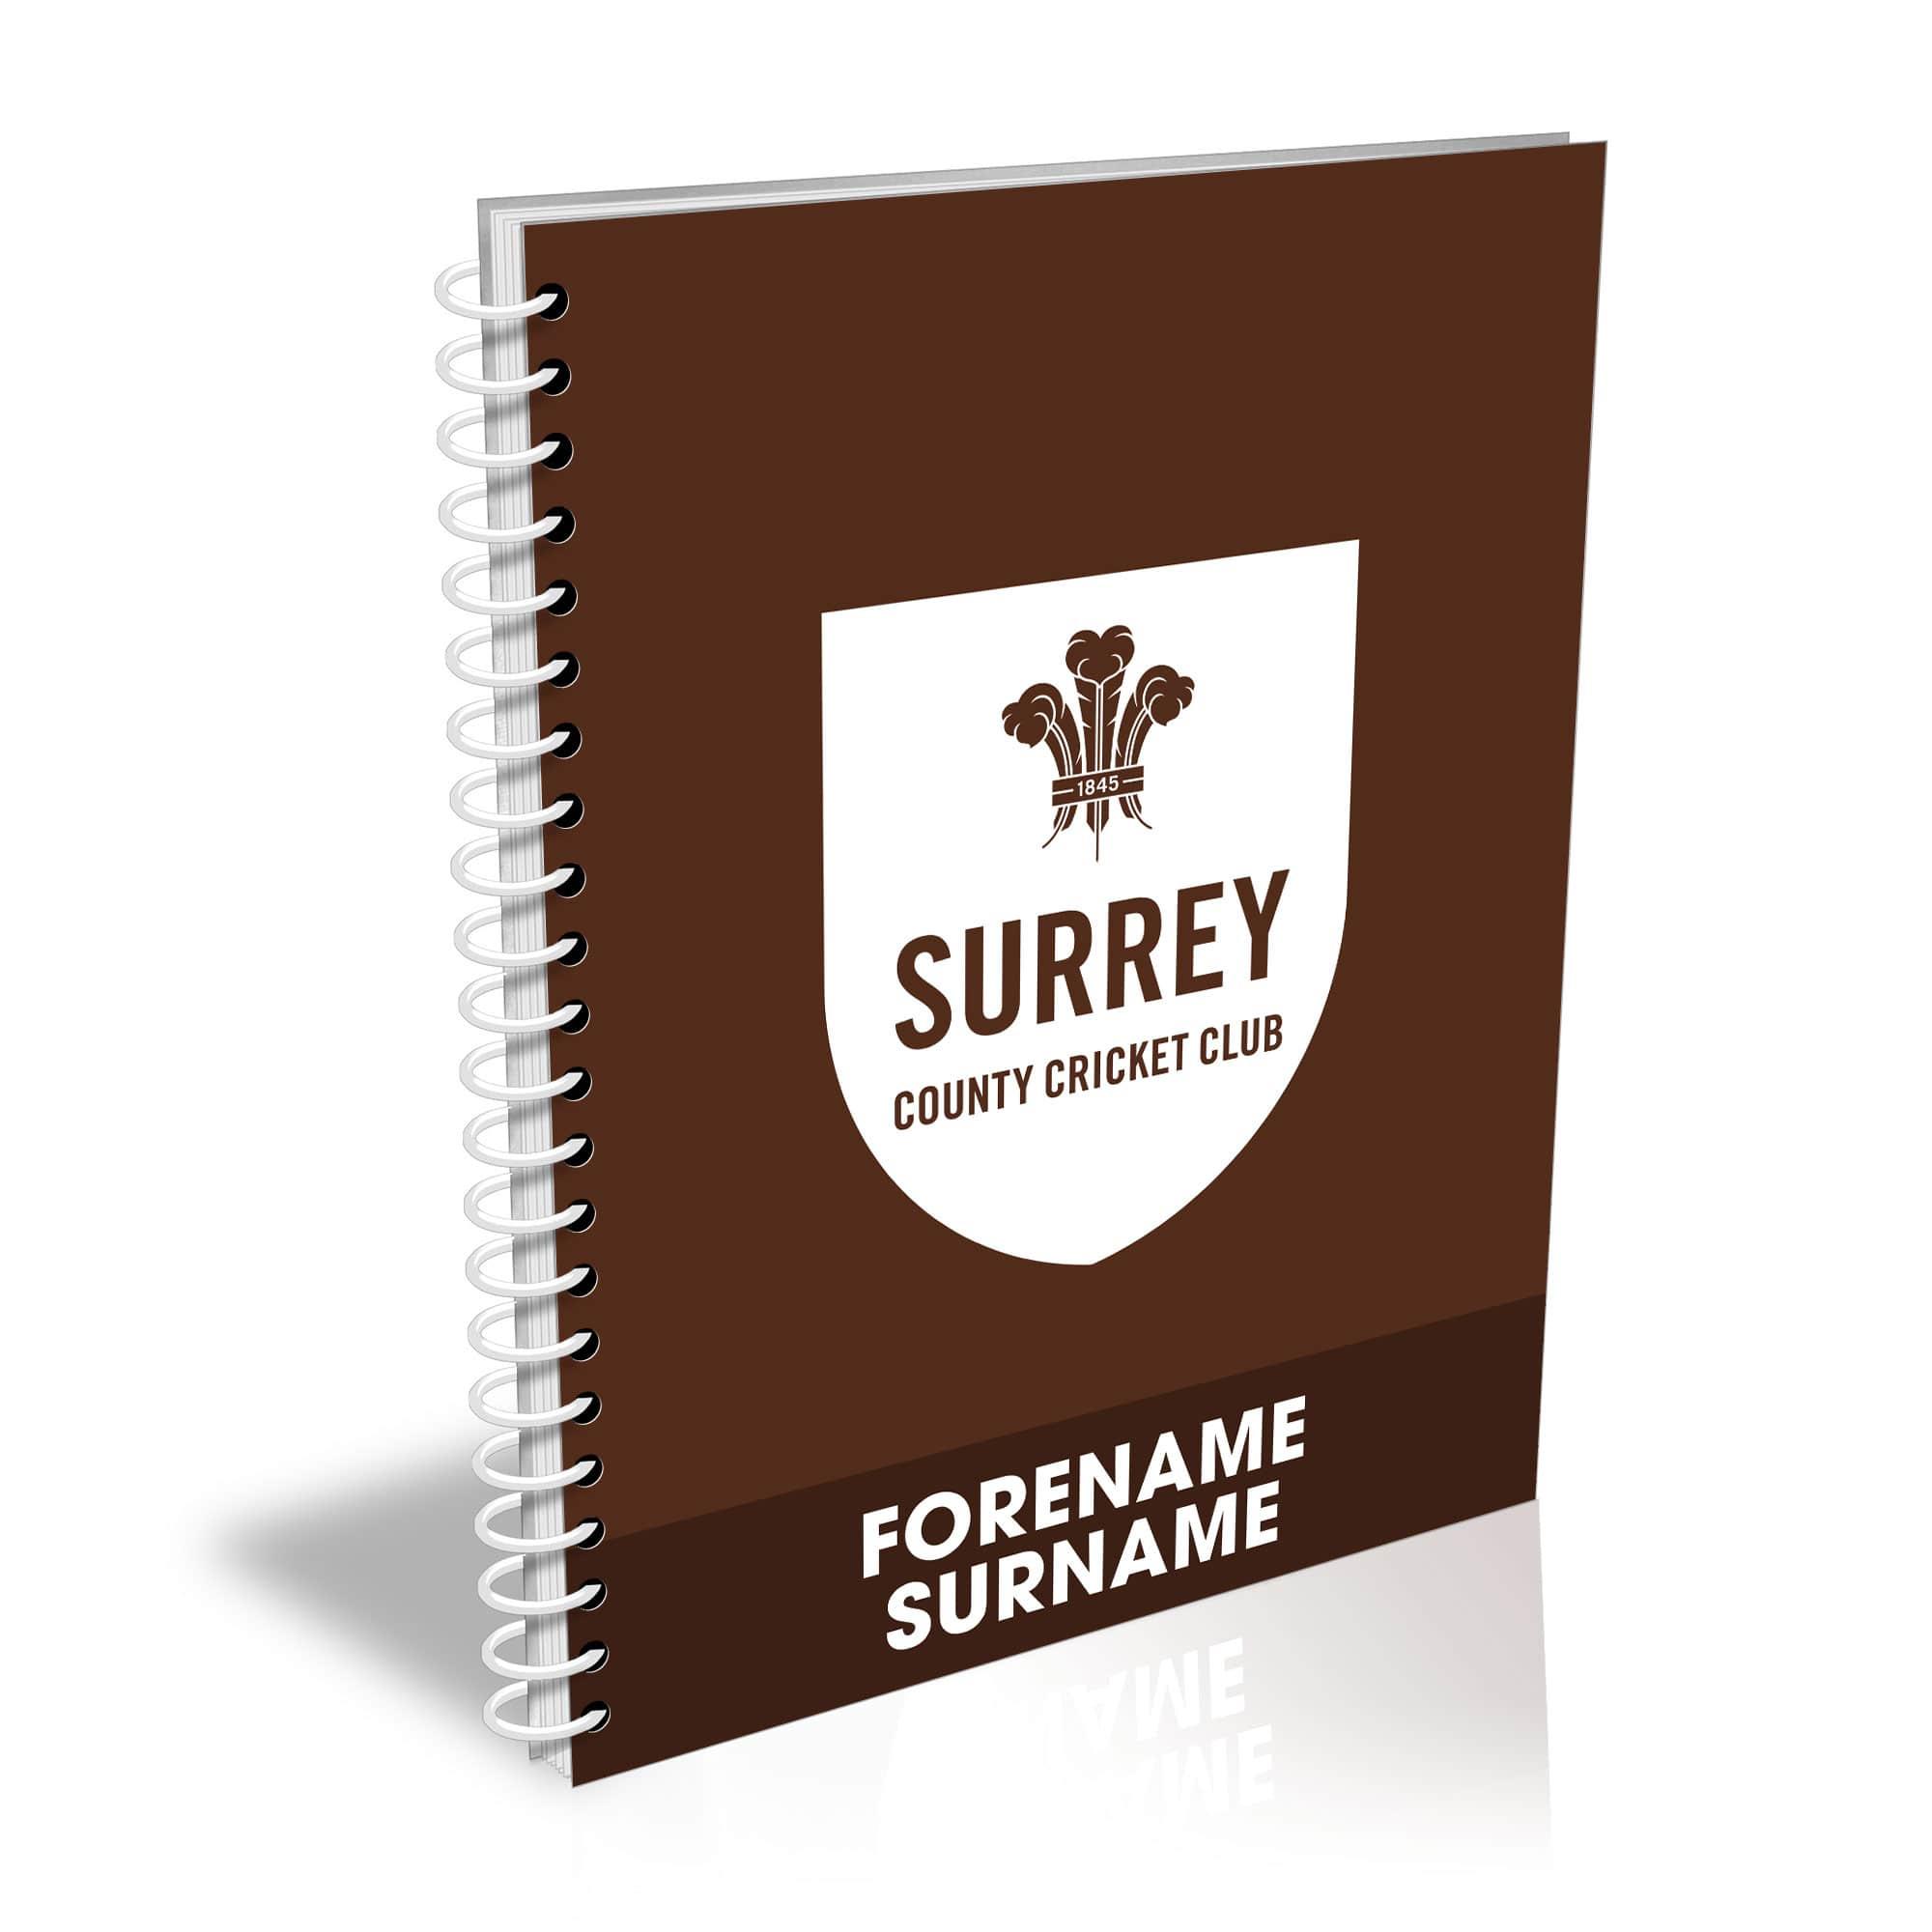 Surrey CCC Bold Crest Notebook